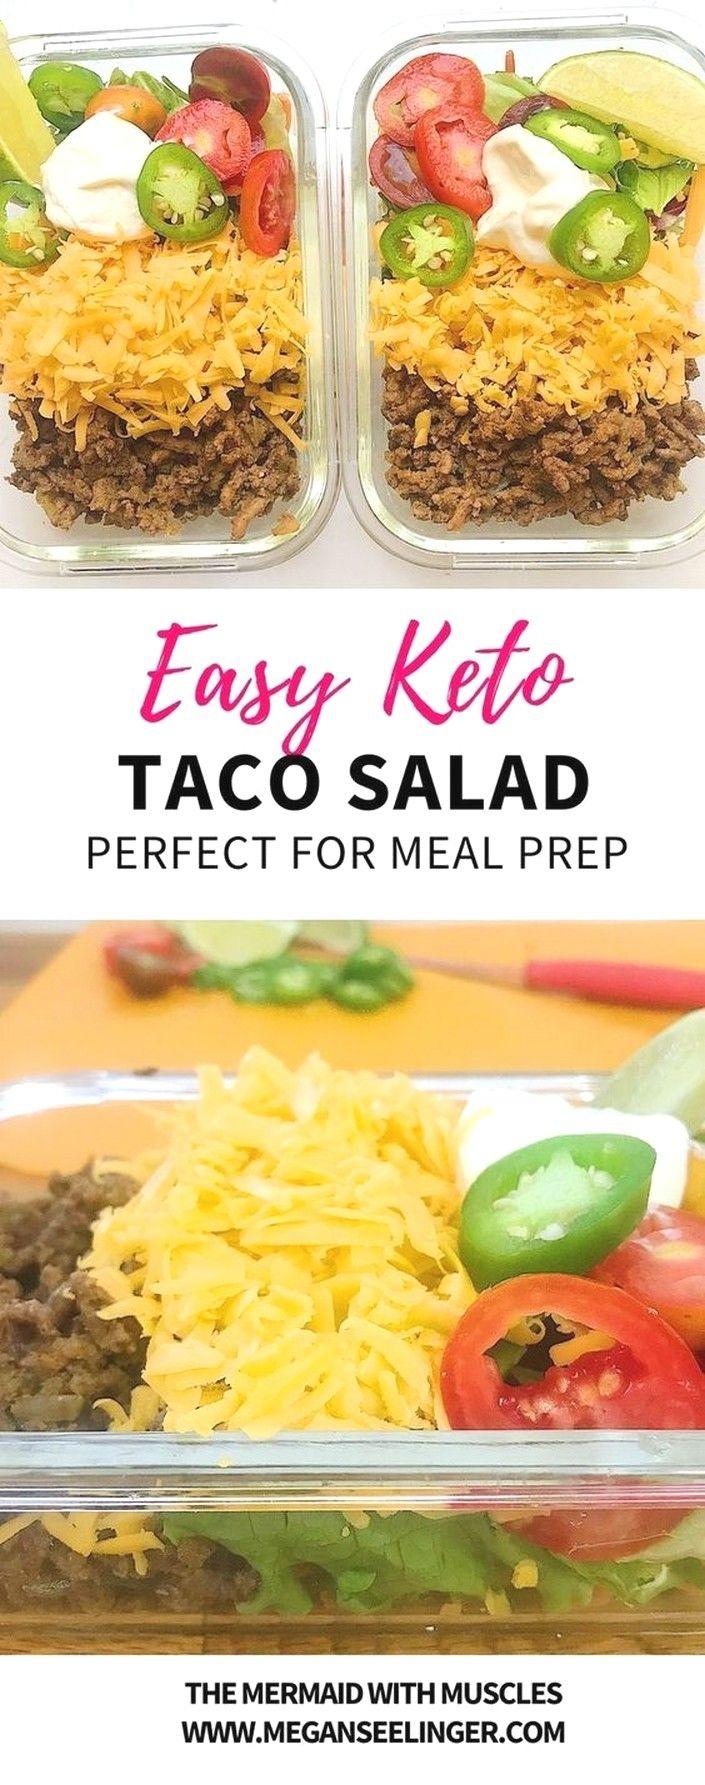 Keto Taco Salad - Easy Keto Ground Beef Recipe   Keto Recipes images